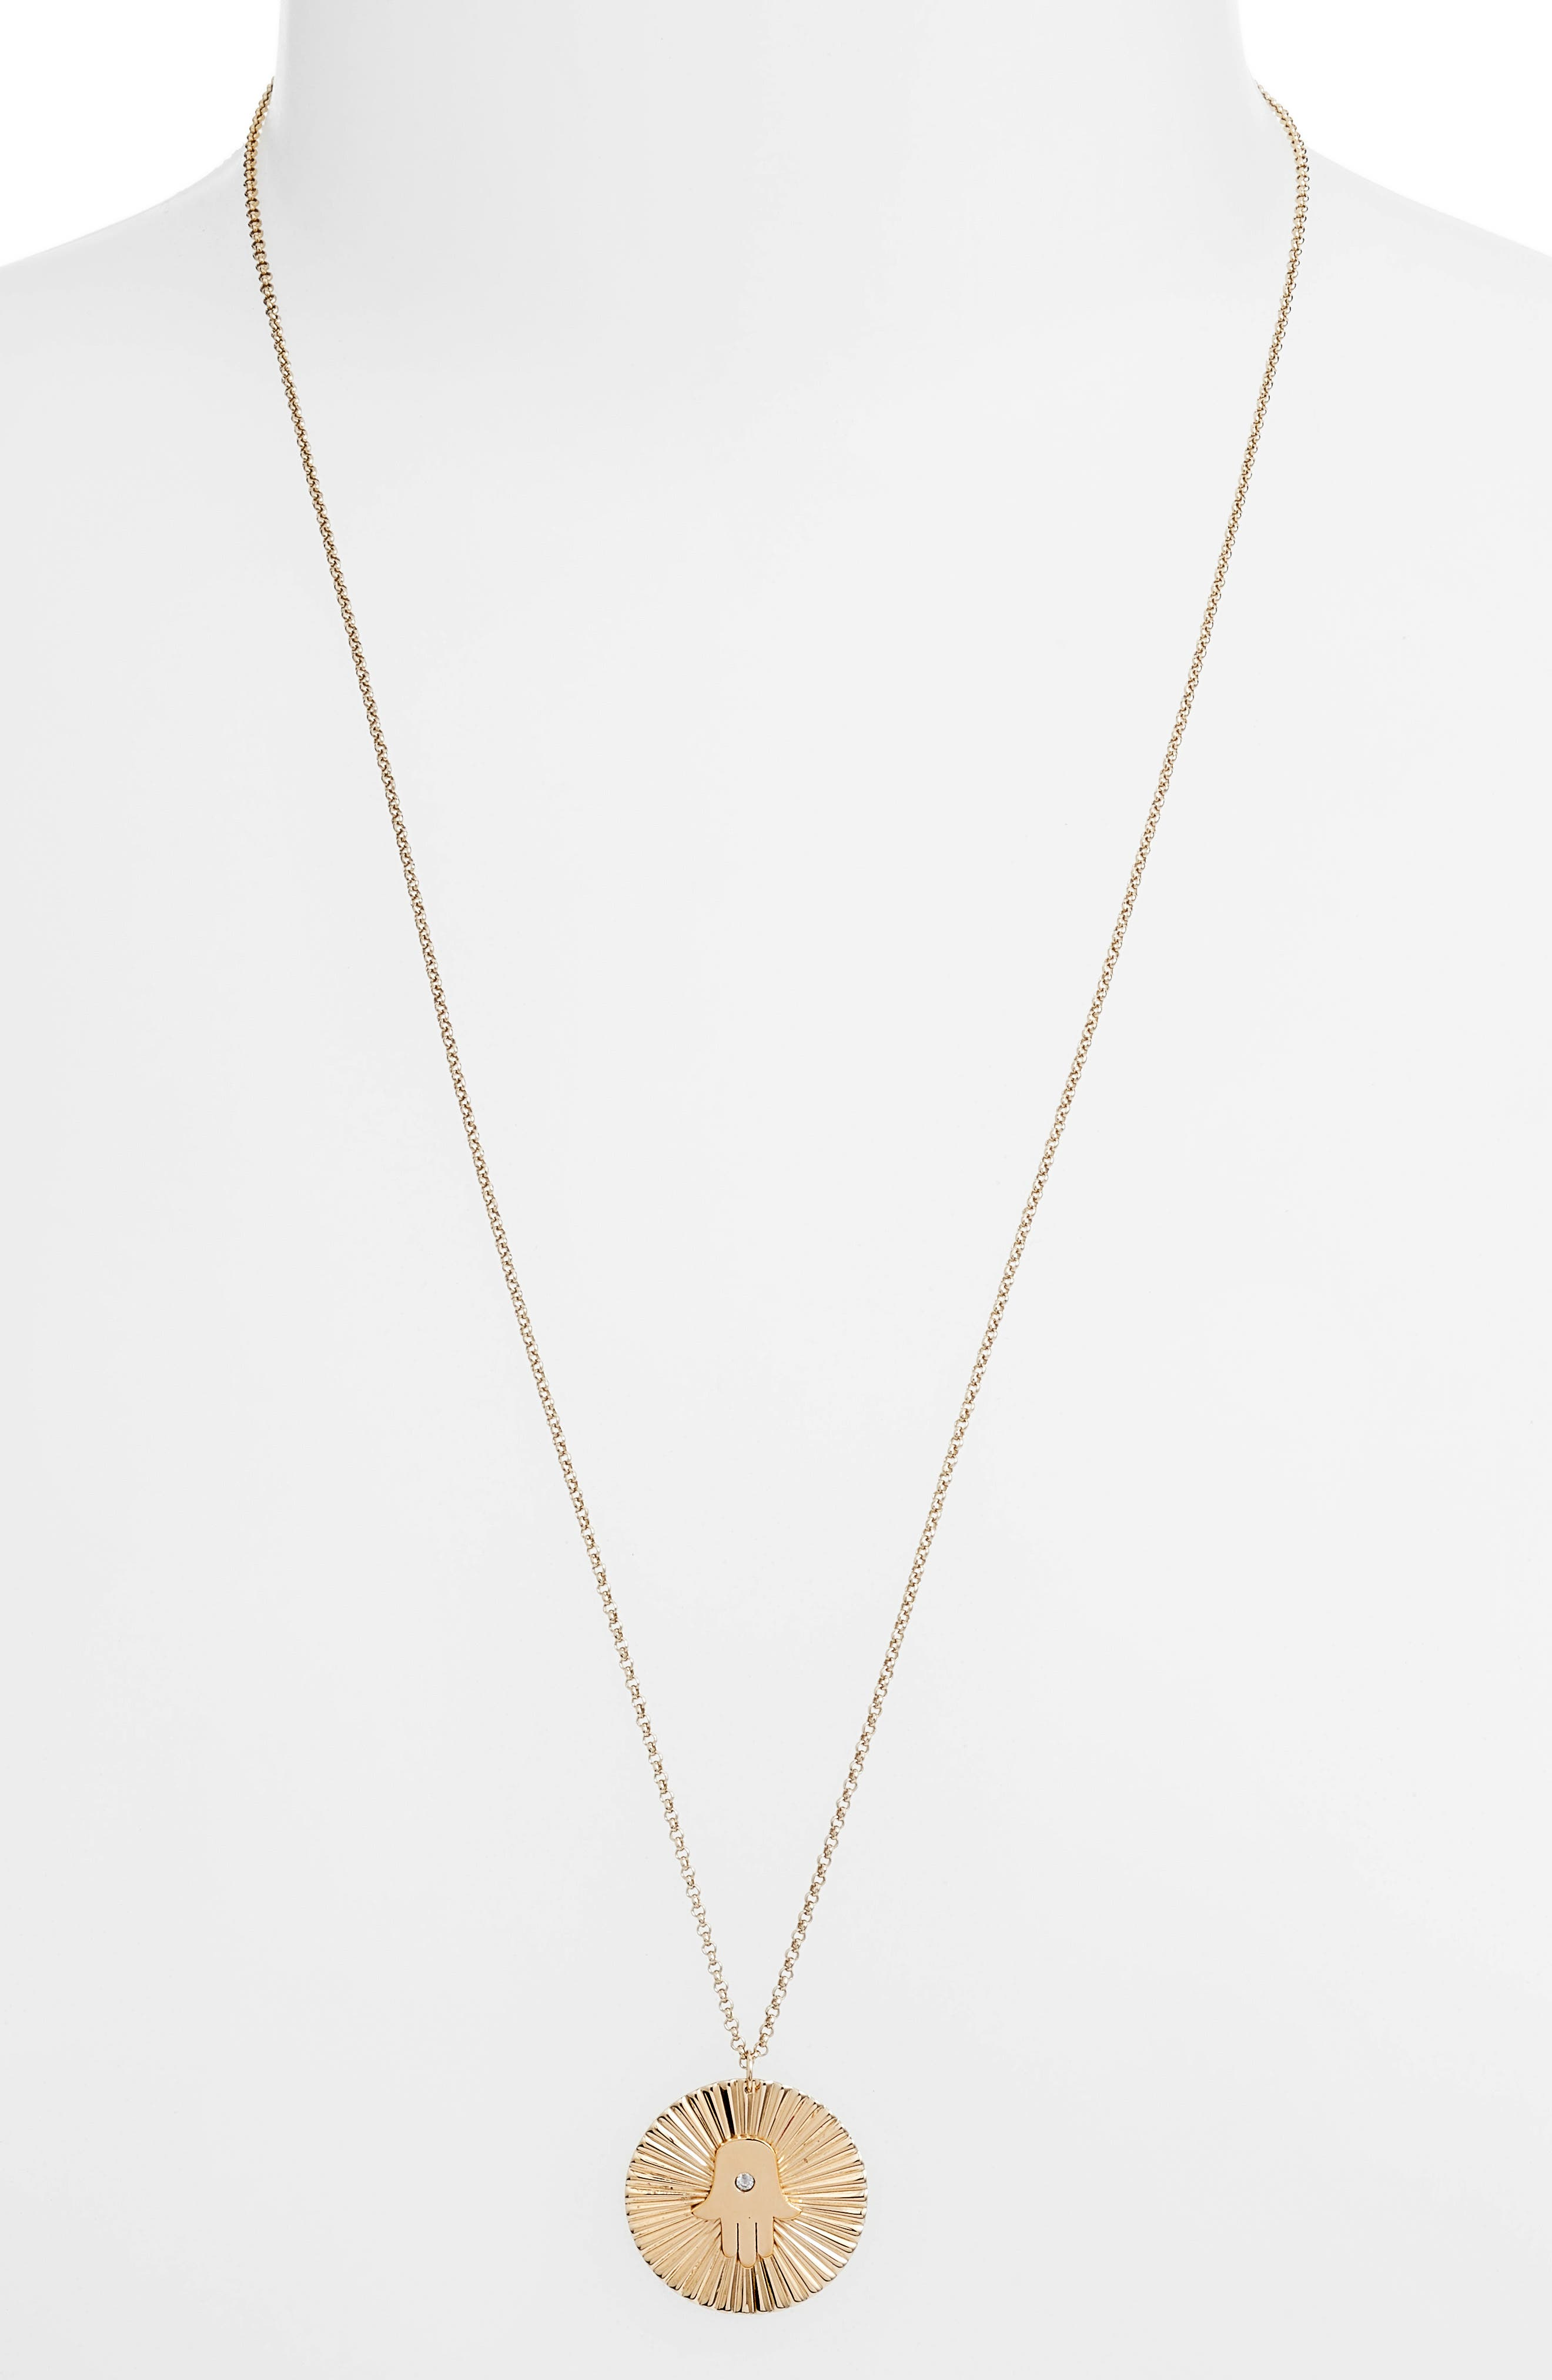 Iris Faith Diamond Pendant Necklace,                         Main,                         color, YELLOW VERMEIL